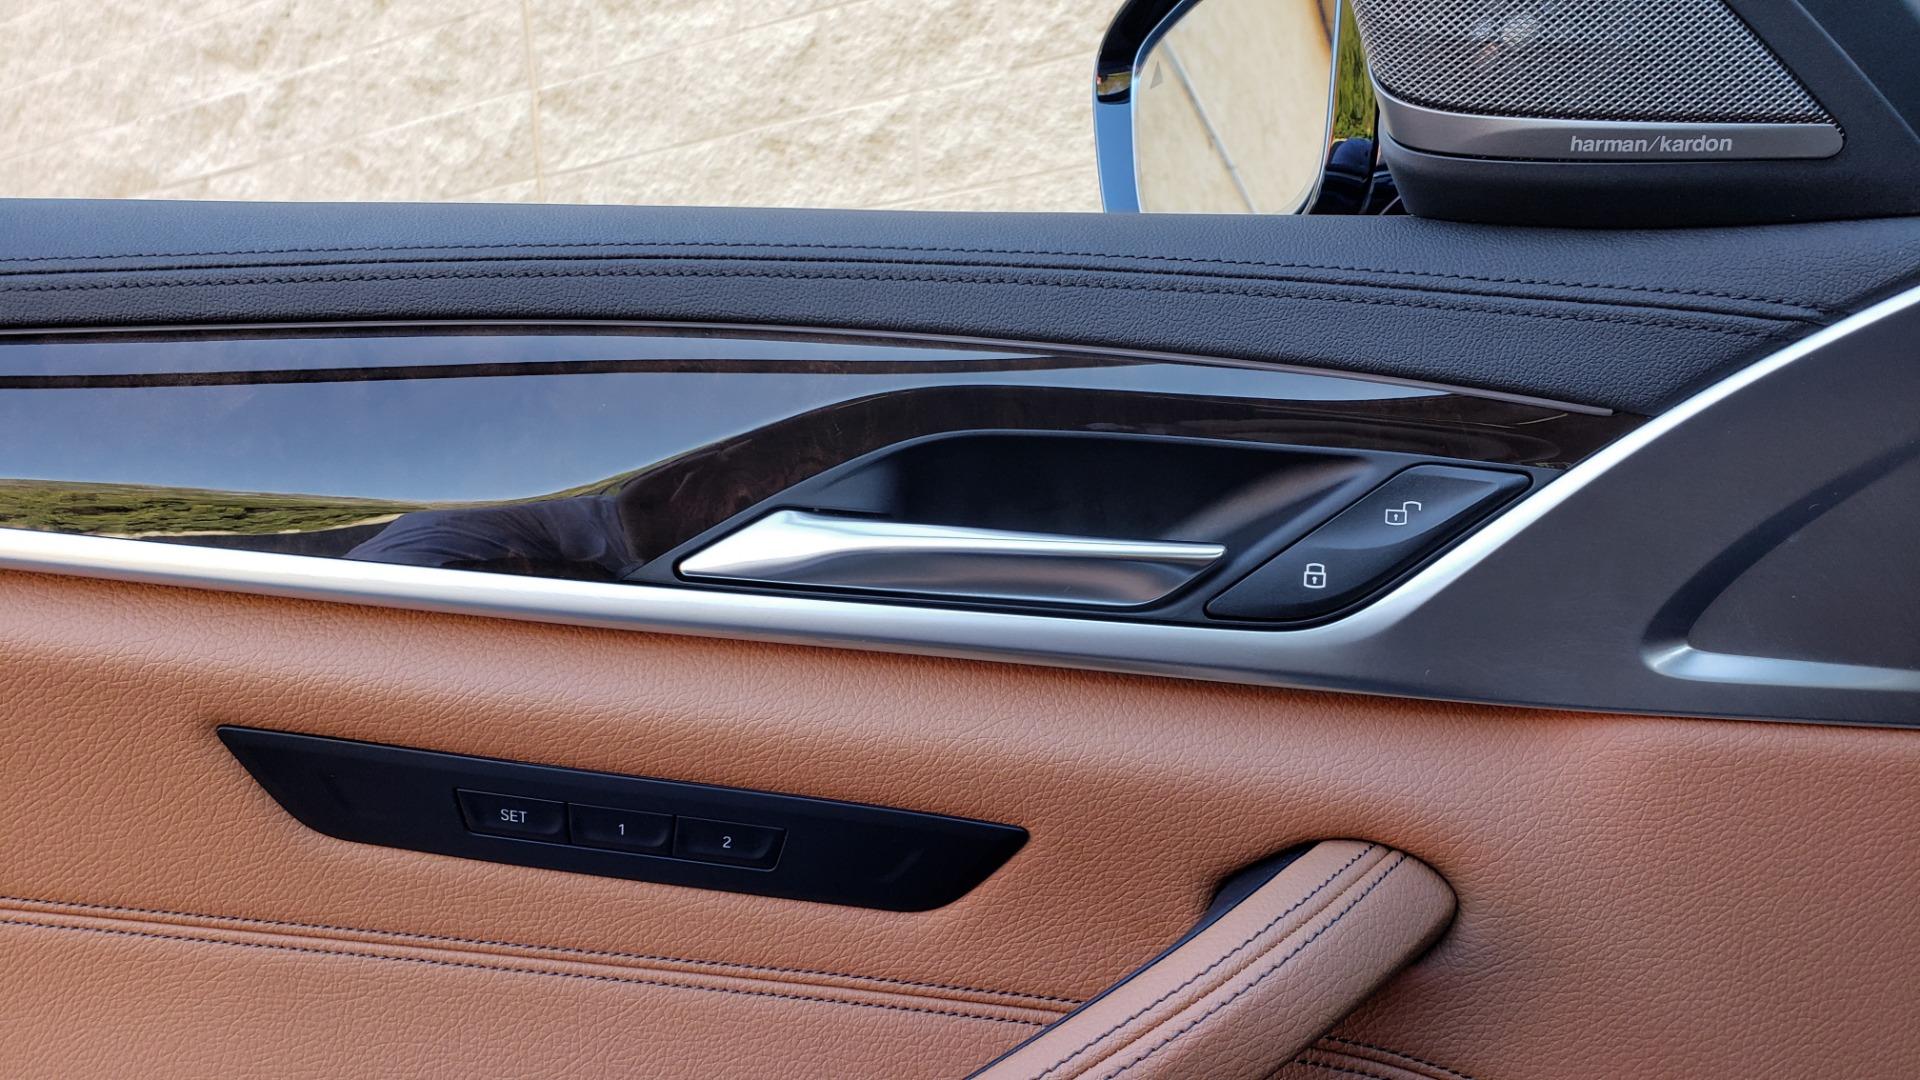 Used 2018 BMW 5 SERIES 540I M-SPORT / DRVR ASST / EXEC PKG / NAV / SUNROOF / HUD / REARVIEW for sale Sold at Formula Imports in Charlotte NC 28227 33